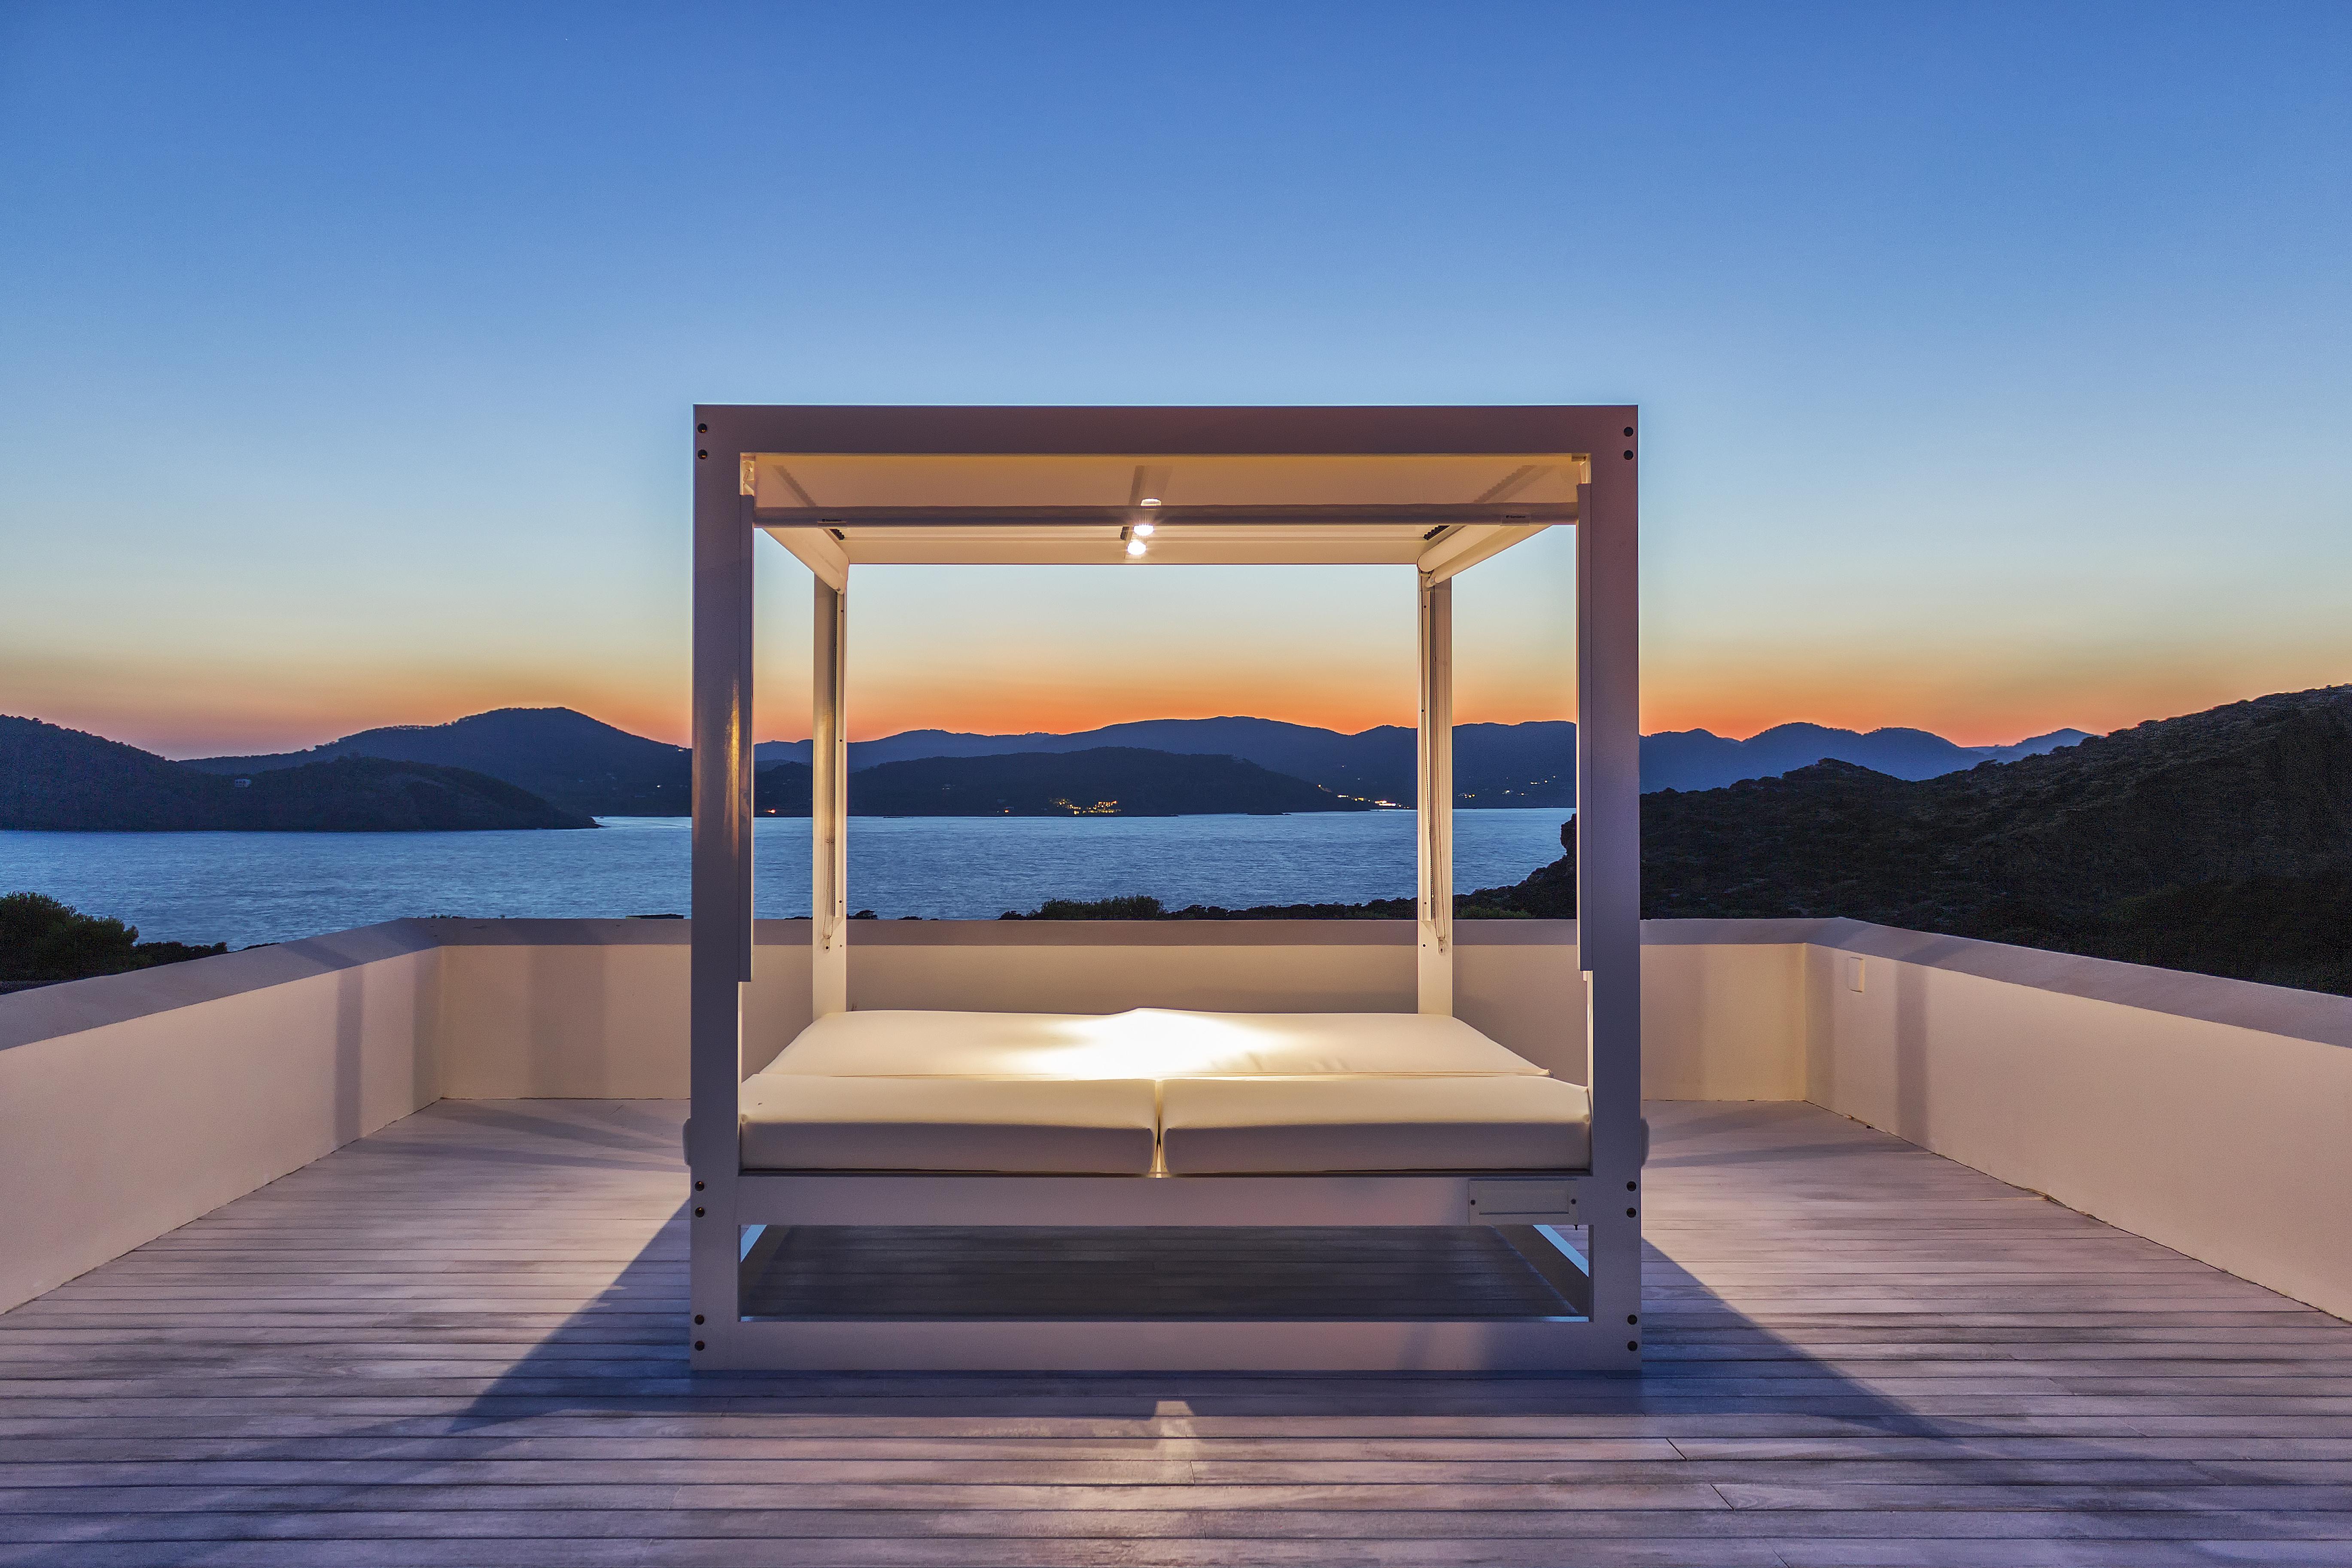 tagomago-luxury-private-island-hire